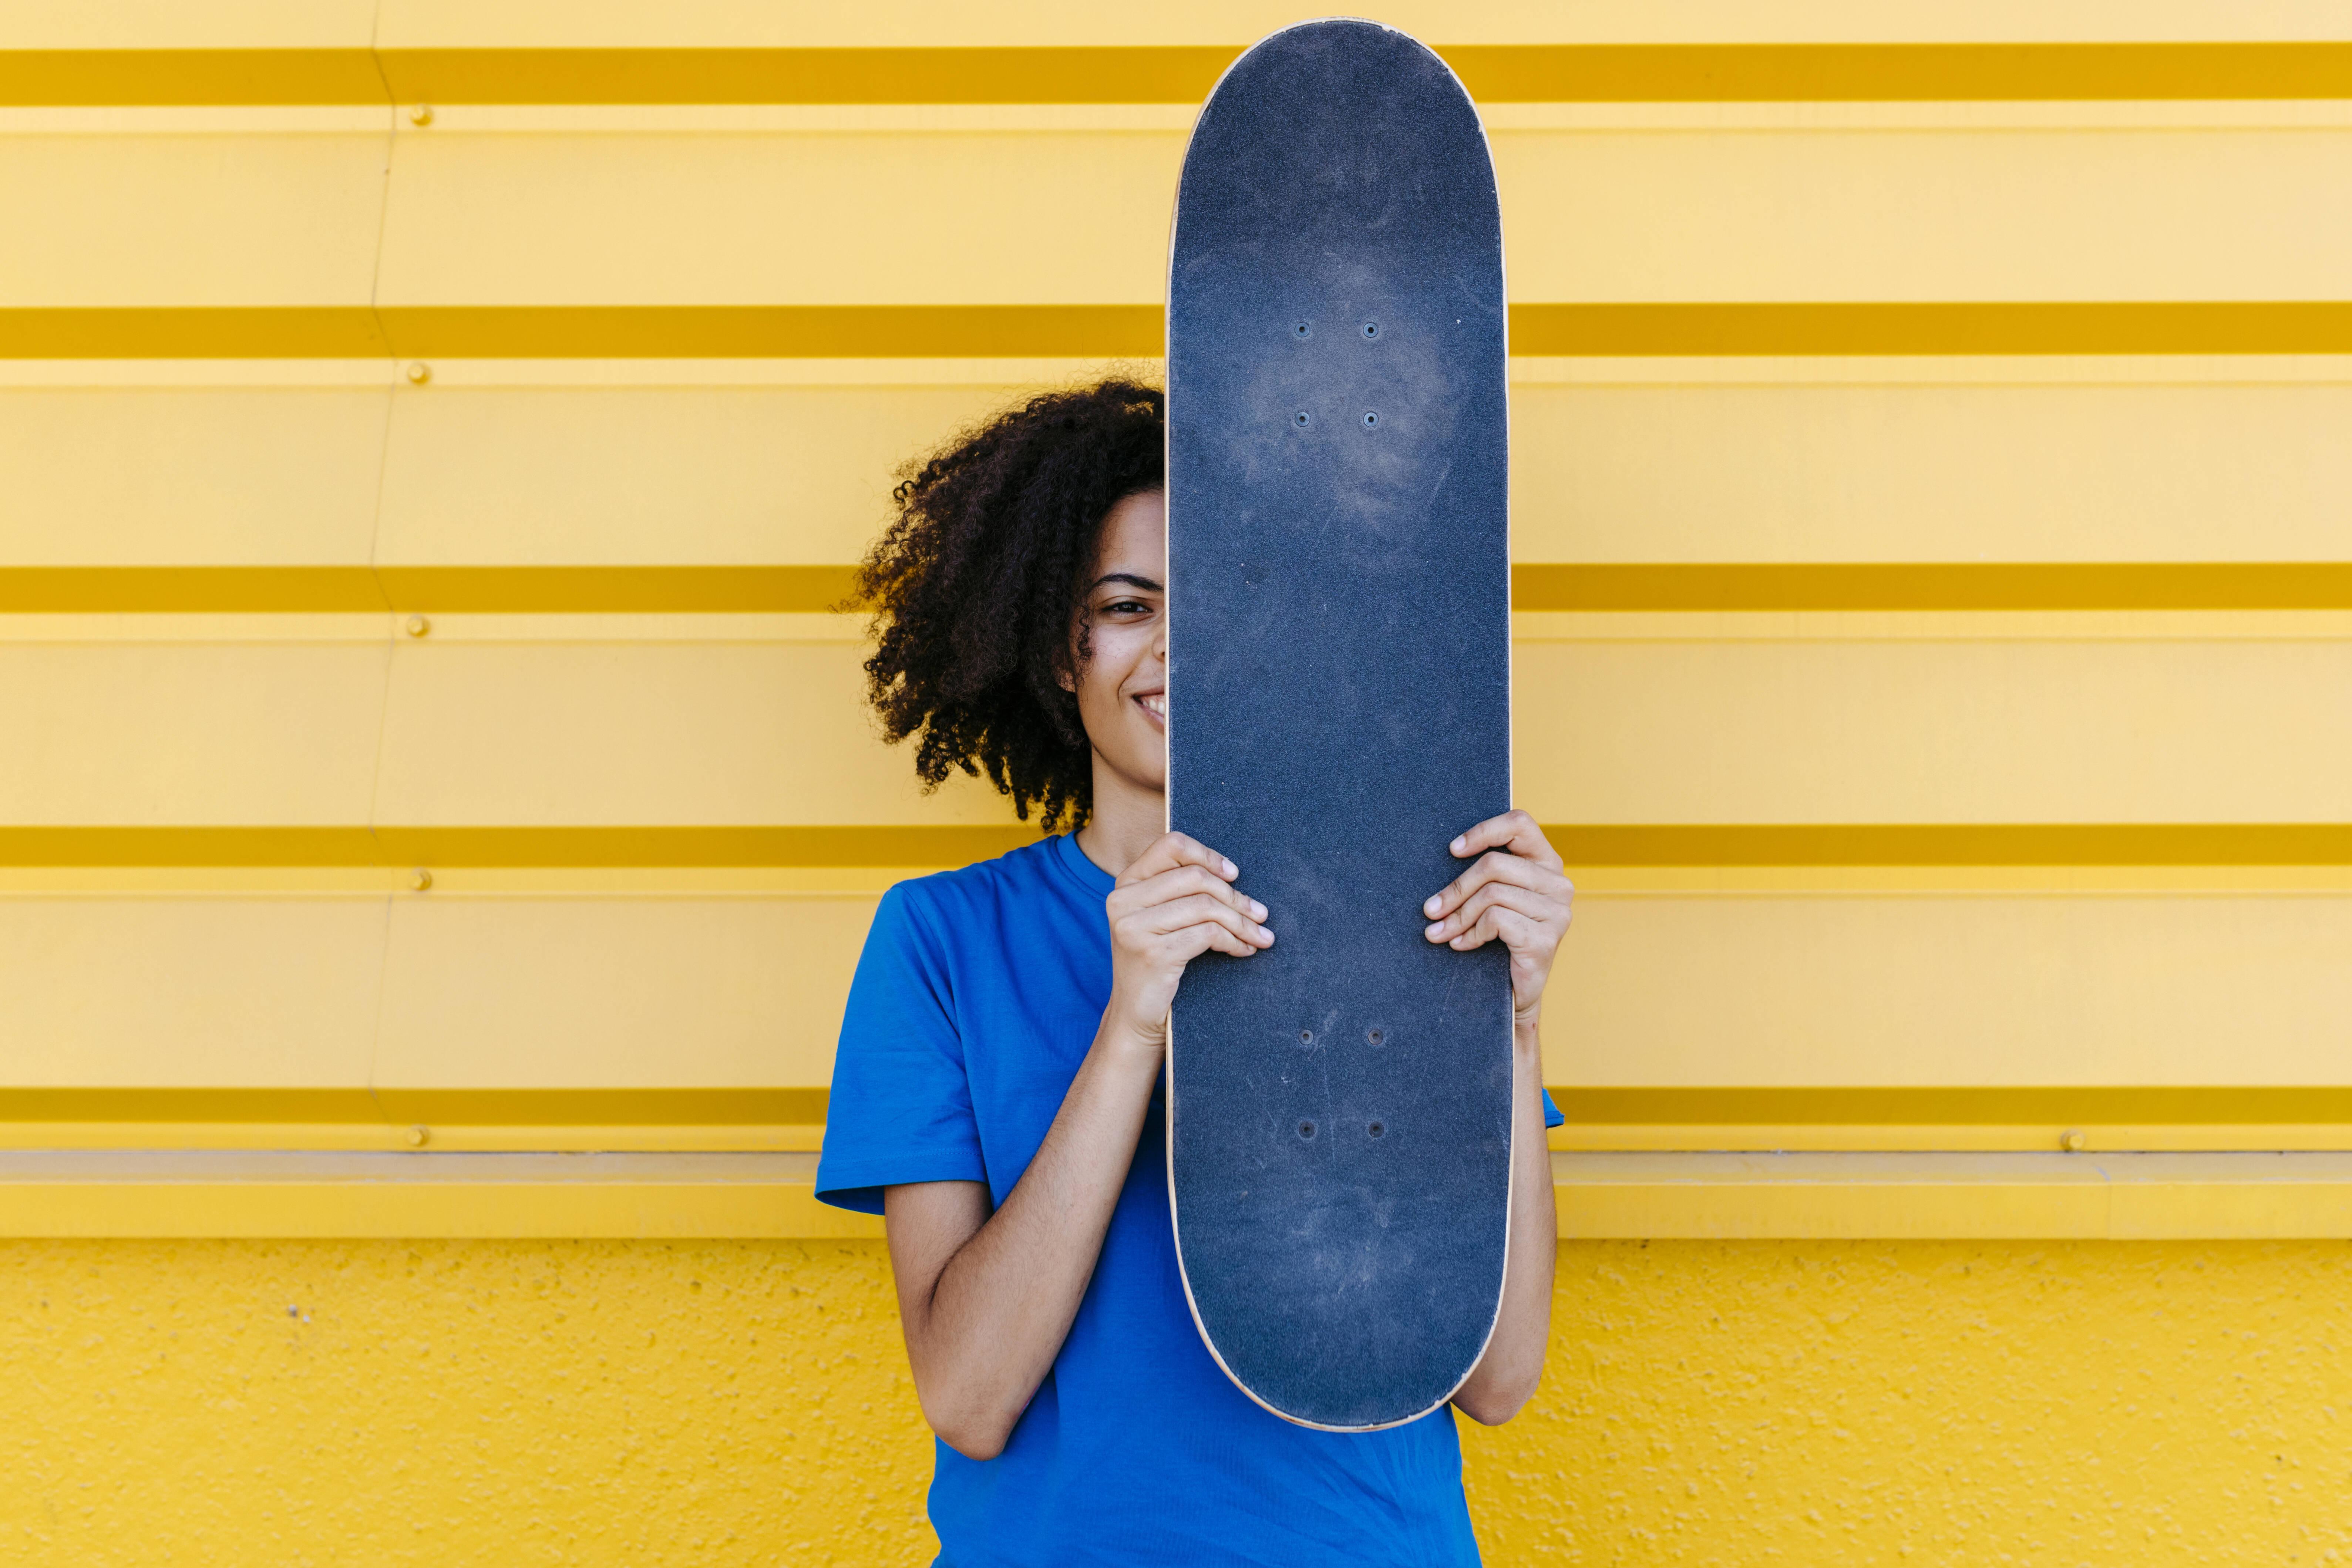 Skateboard selber gestalten - so geht's